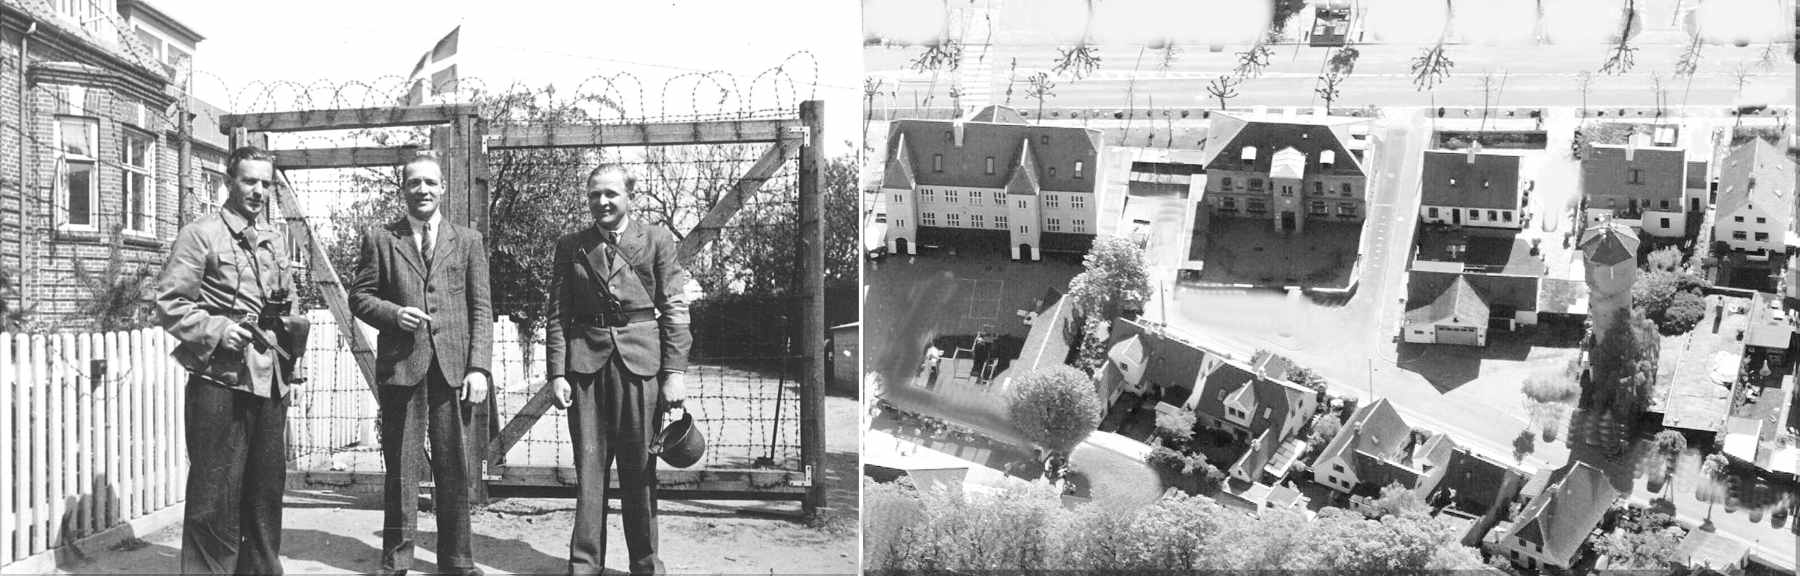 Gestapo i Dragør